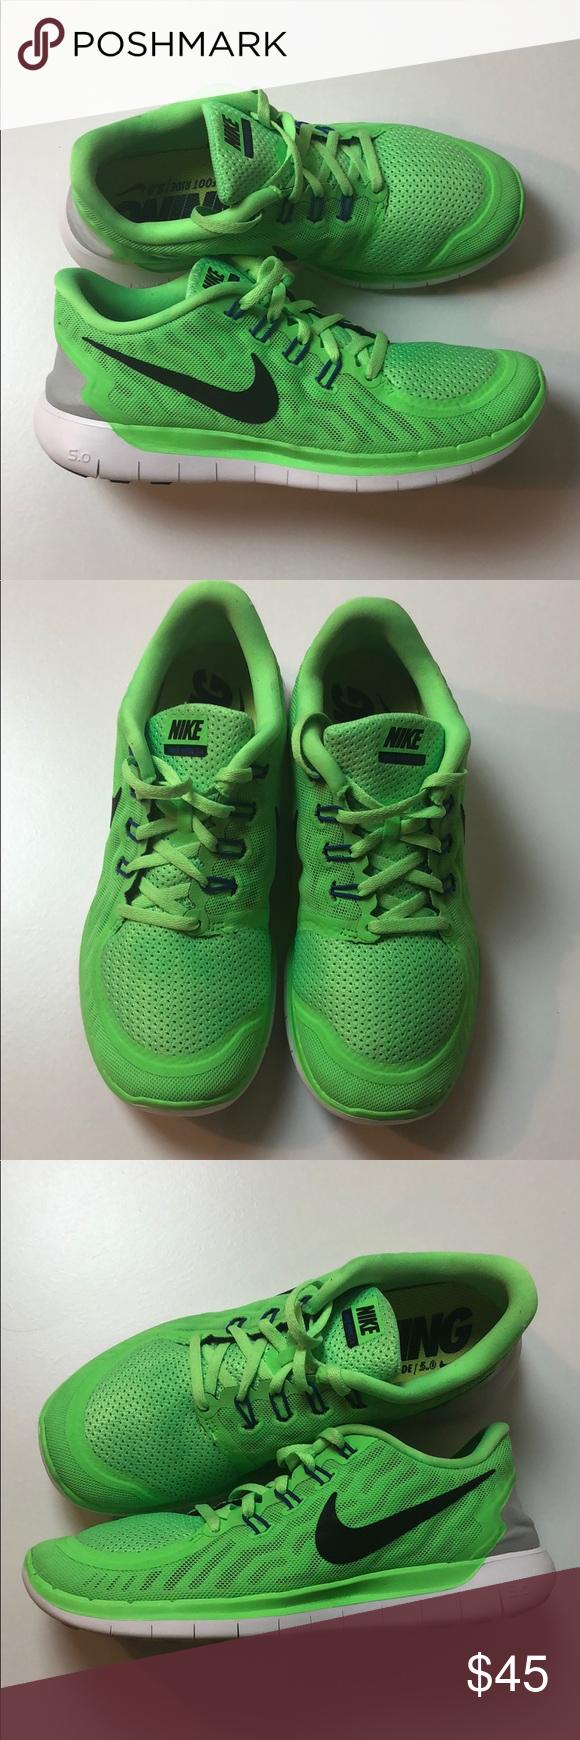 Recuerdo dos semanas Desgastar  Nike Free 5.0 Running Bare ride Neon Green | Nike free, Nike neon, Womens  shoes sneakers